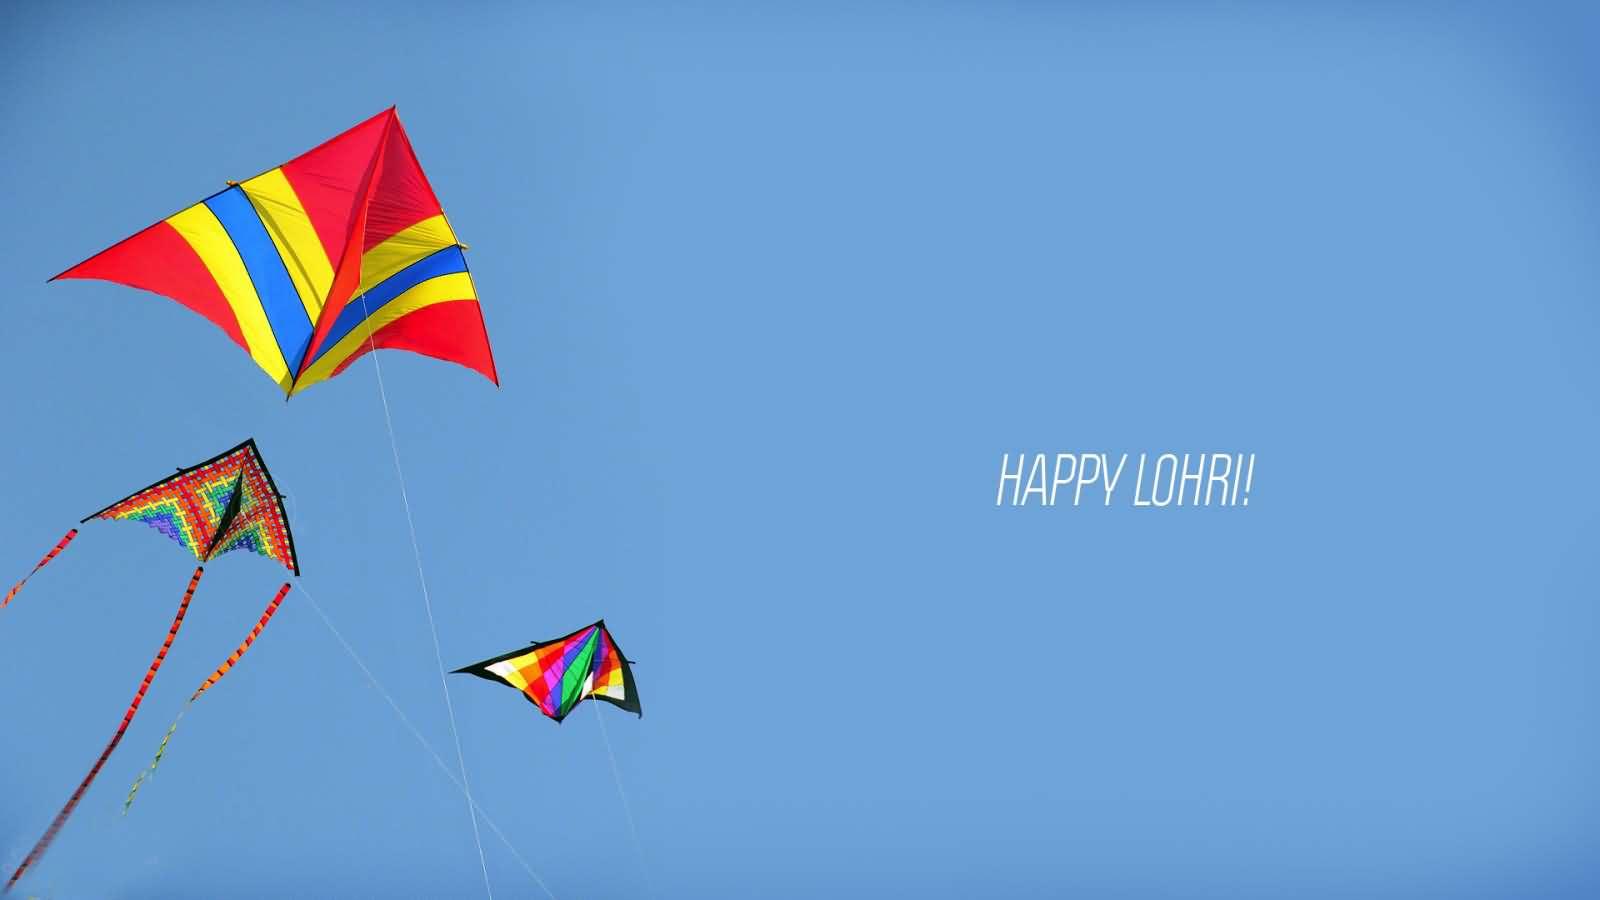 Happy Lohri Beautiful Kites In Sky